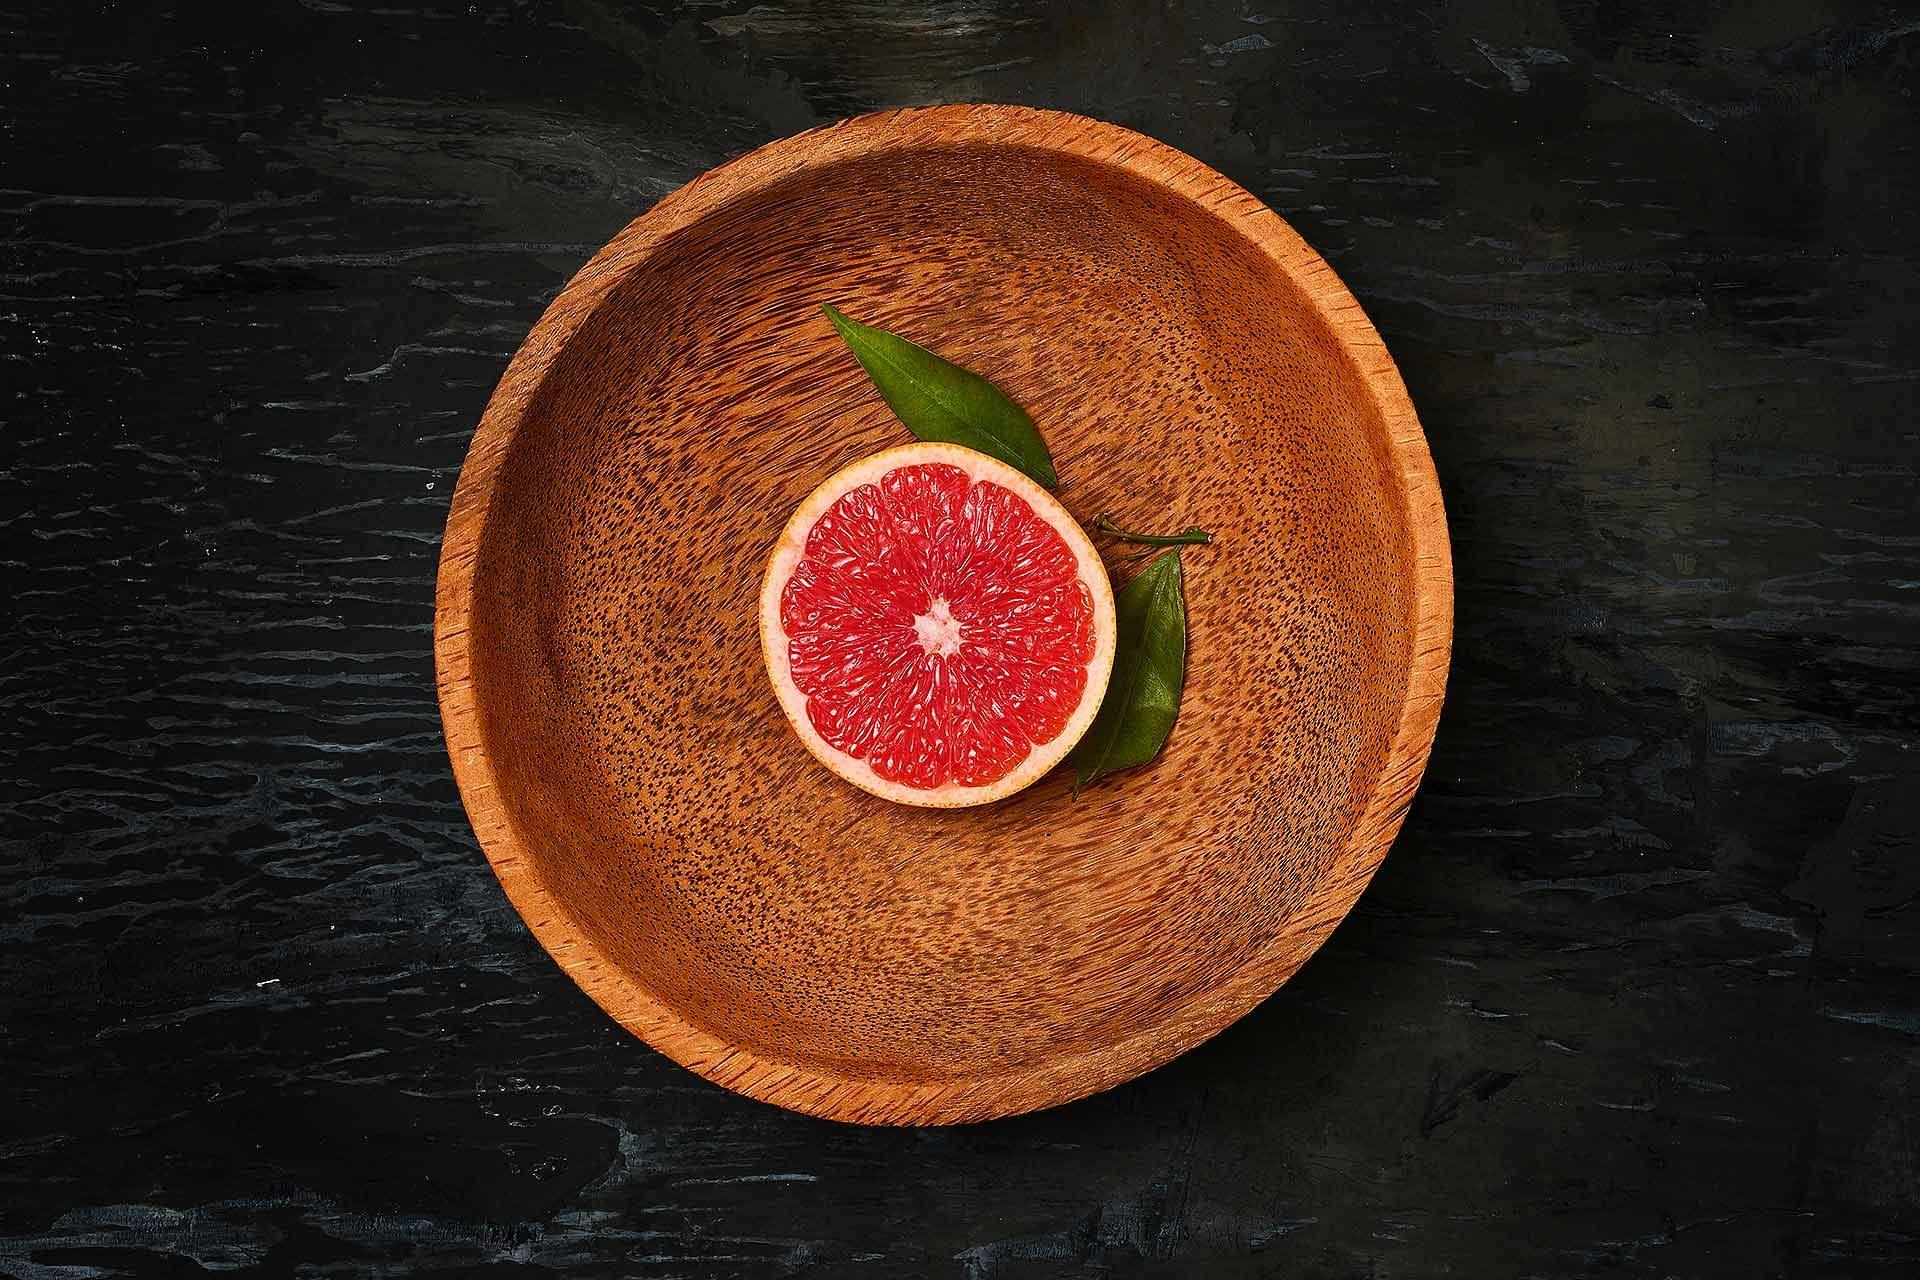 grapefruit-citrus-fruit-halves-on-wooden-plate-PHCQJD7